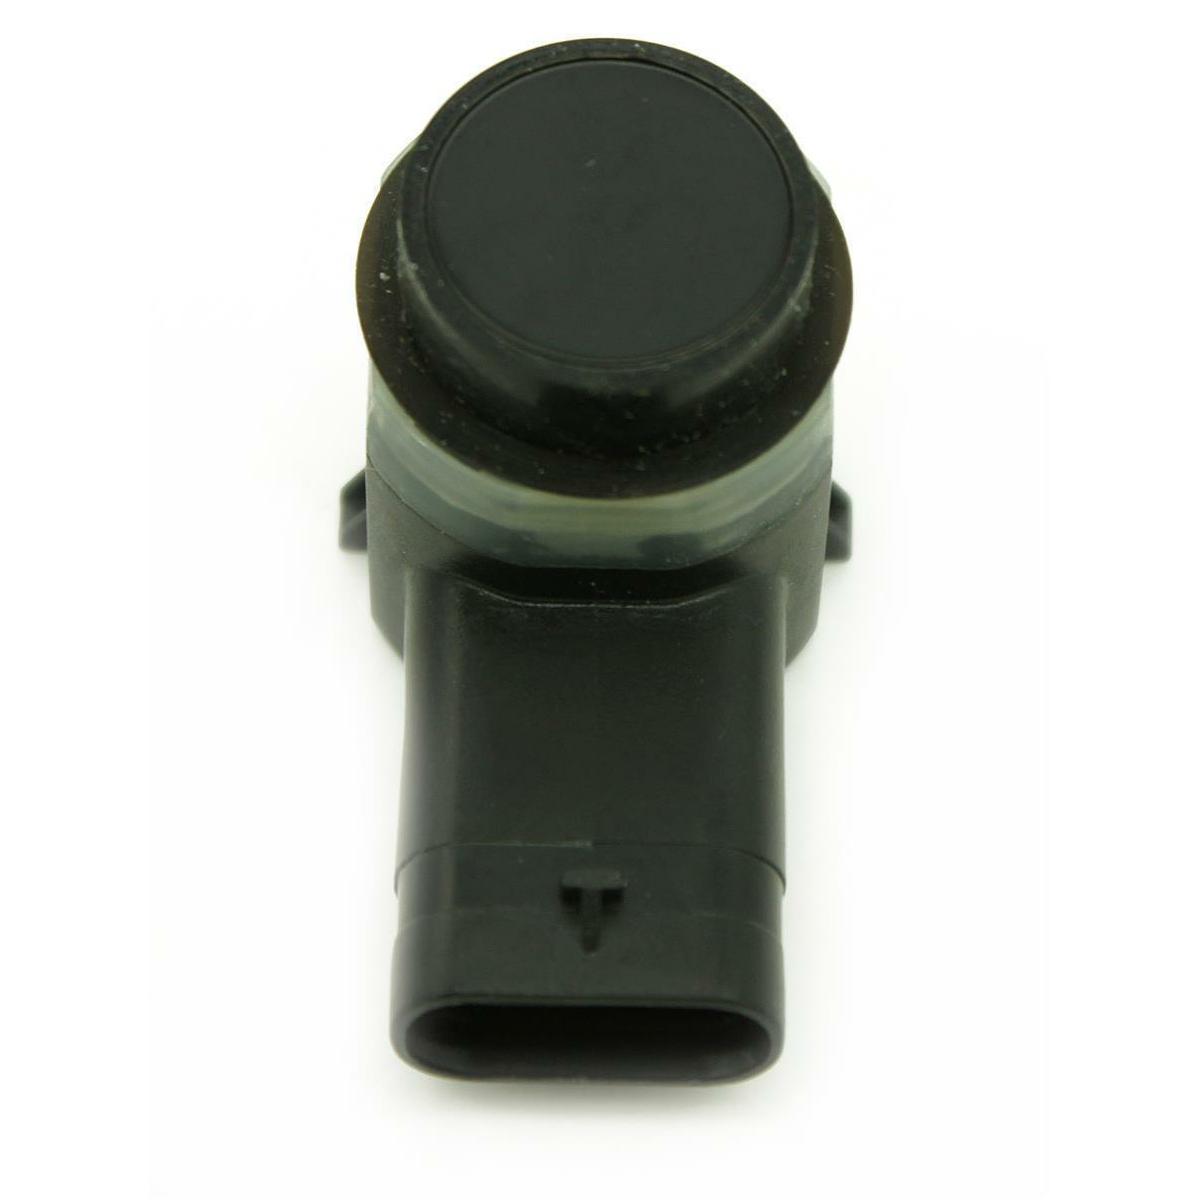 Parksensor AM5T-15K868-AA für Ford PDC Parktronic